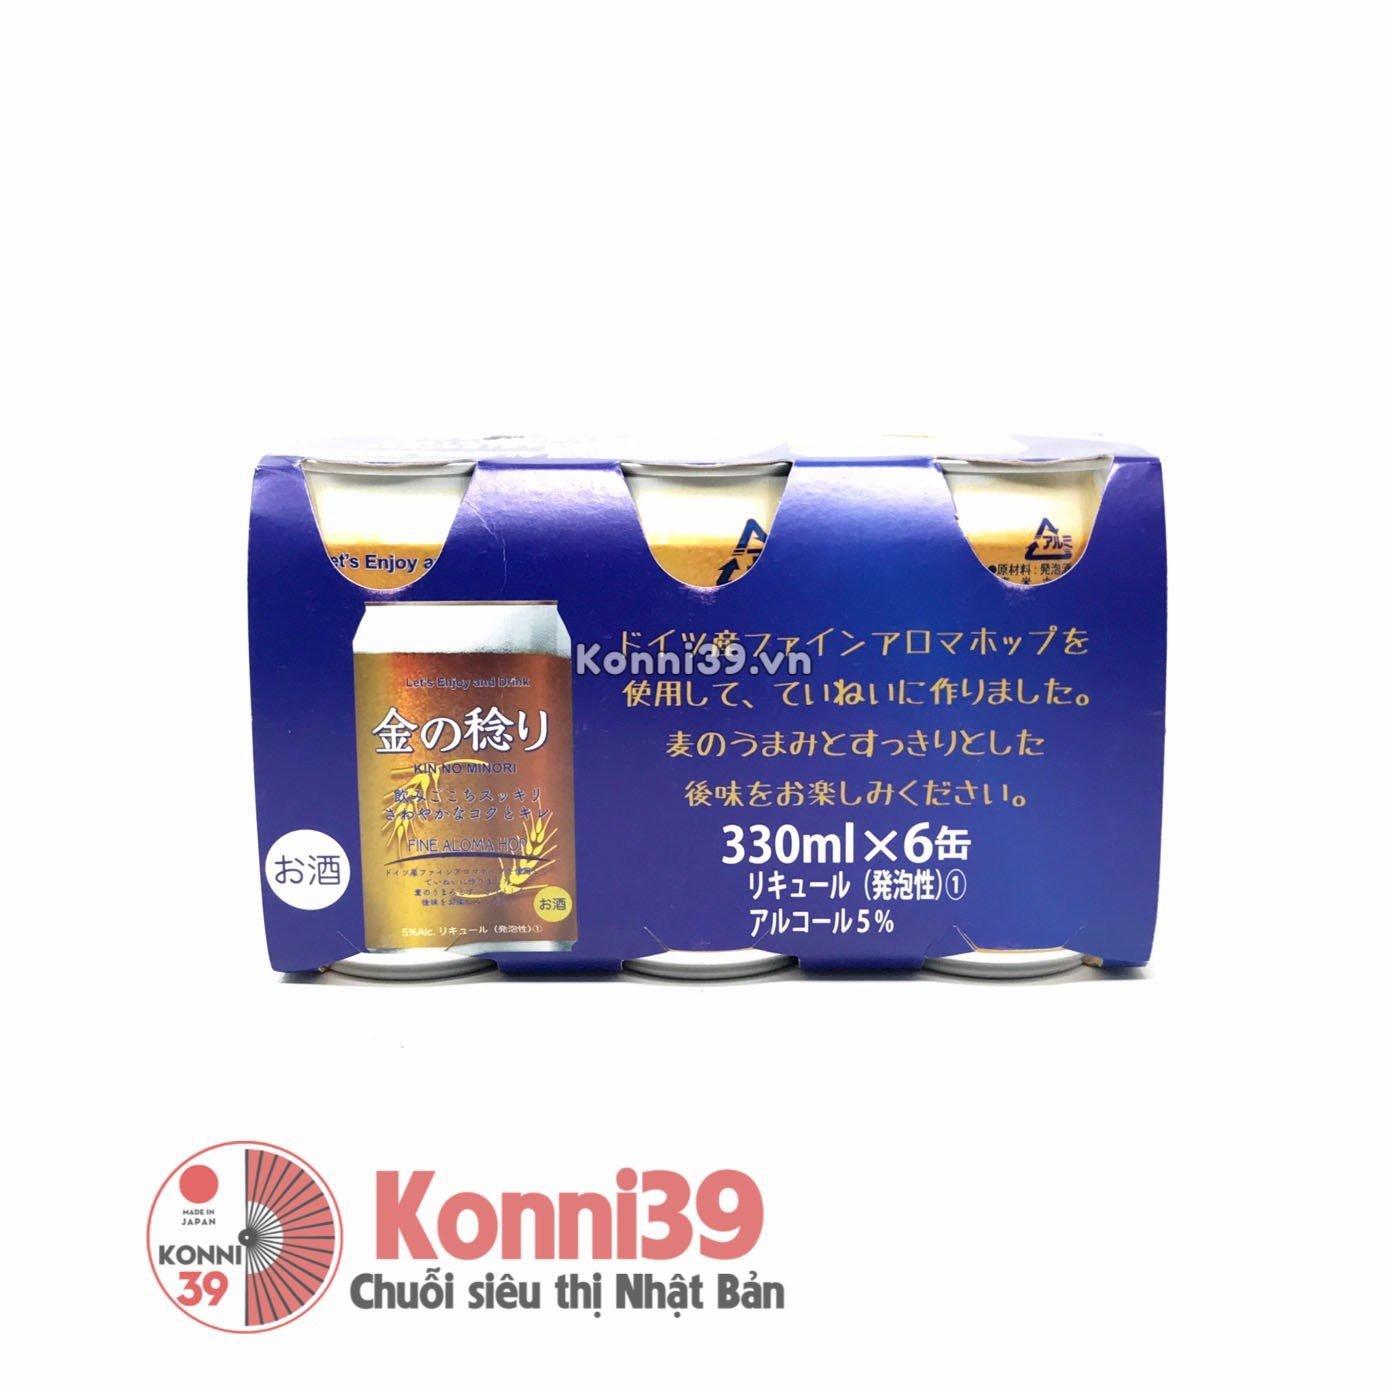 bia-kin-no-minori-lon-330ml-pack-6-lon